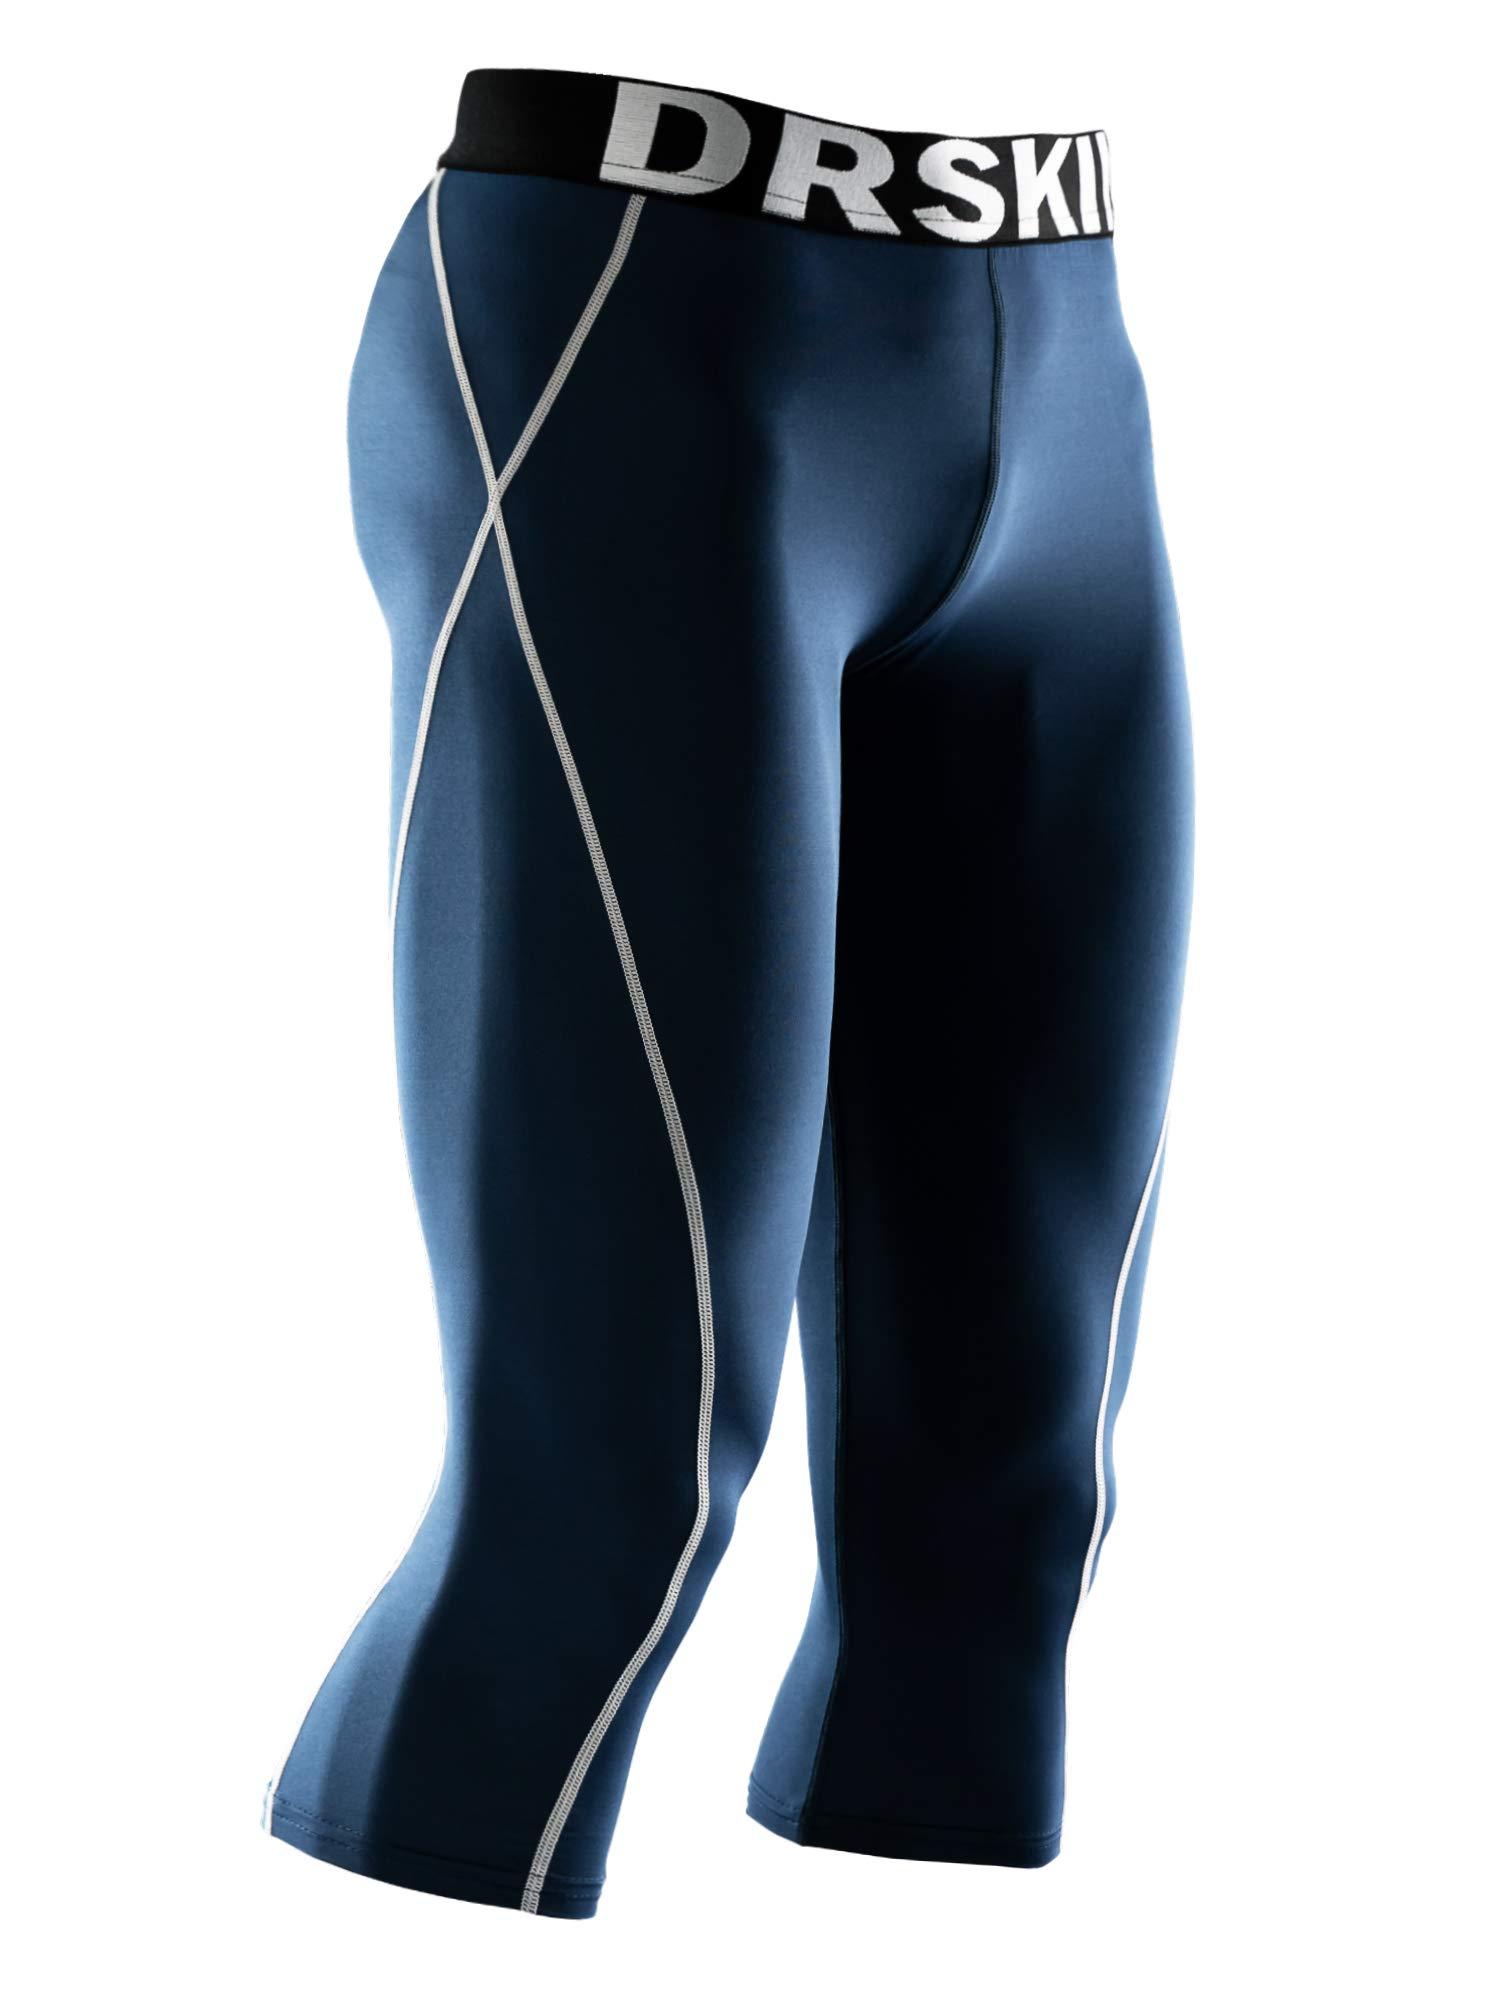 DRSKIN] Tight 3/4 Compression Pants Base Layer Running Pants Men (2XL, NG803) by DRSKIN